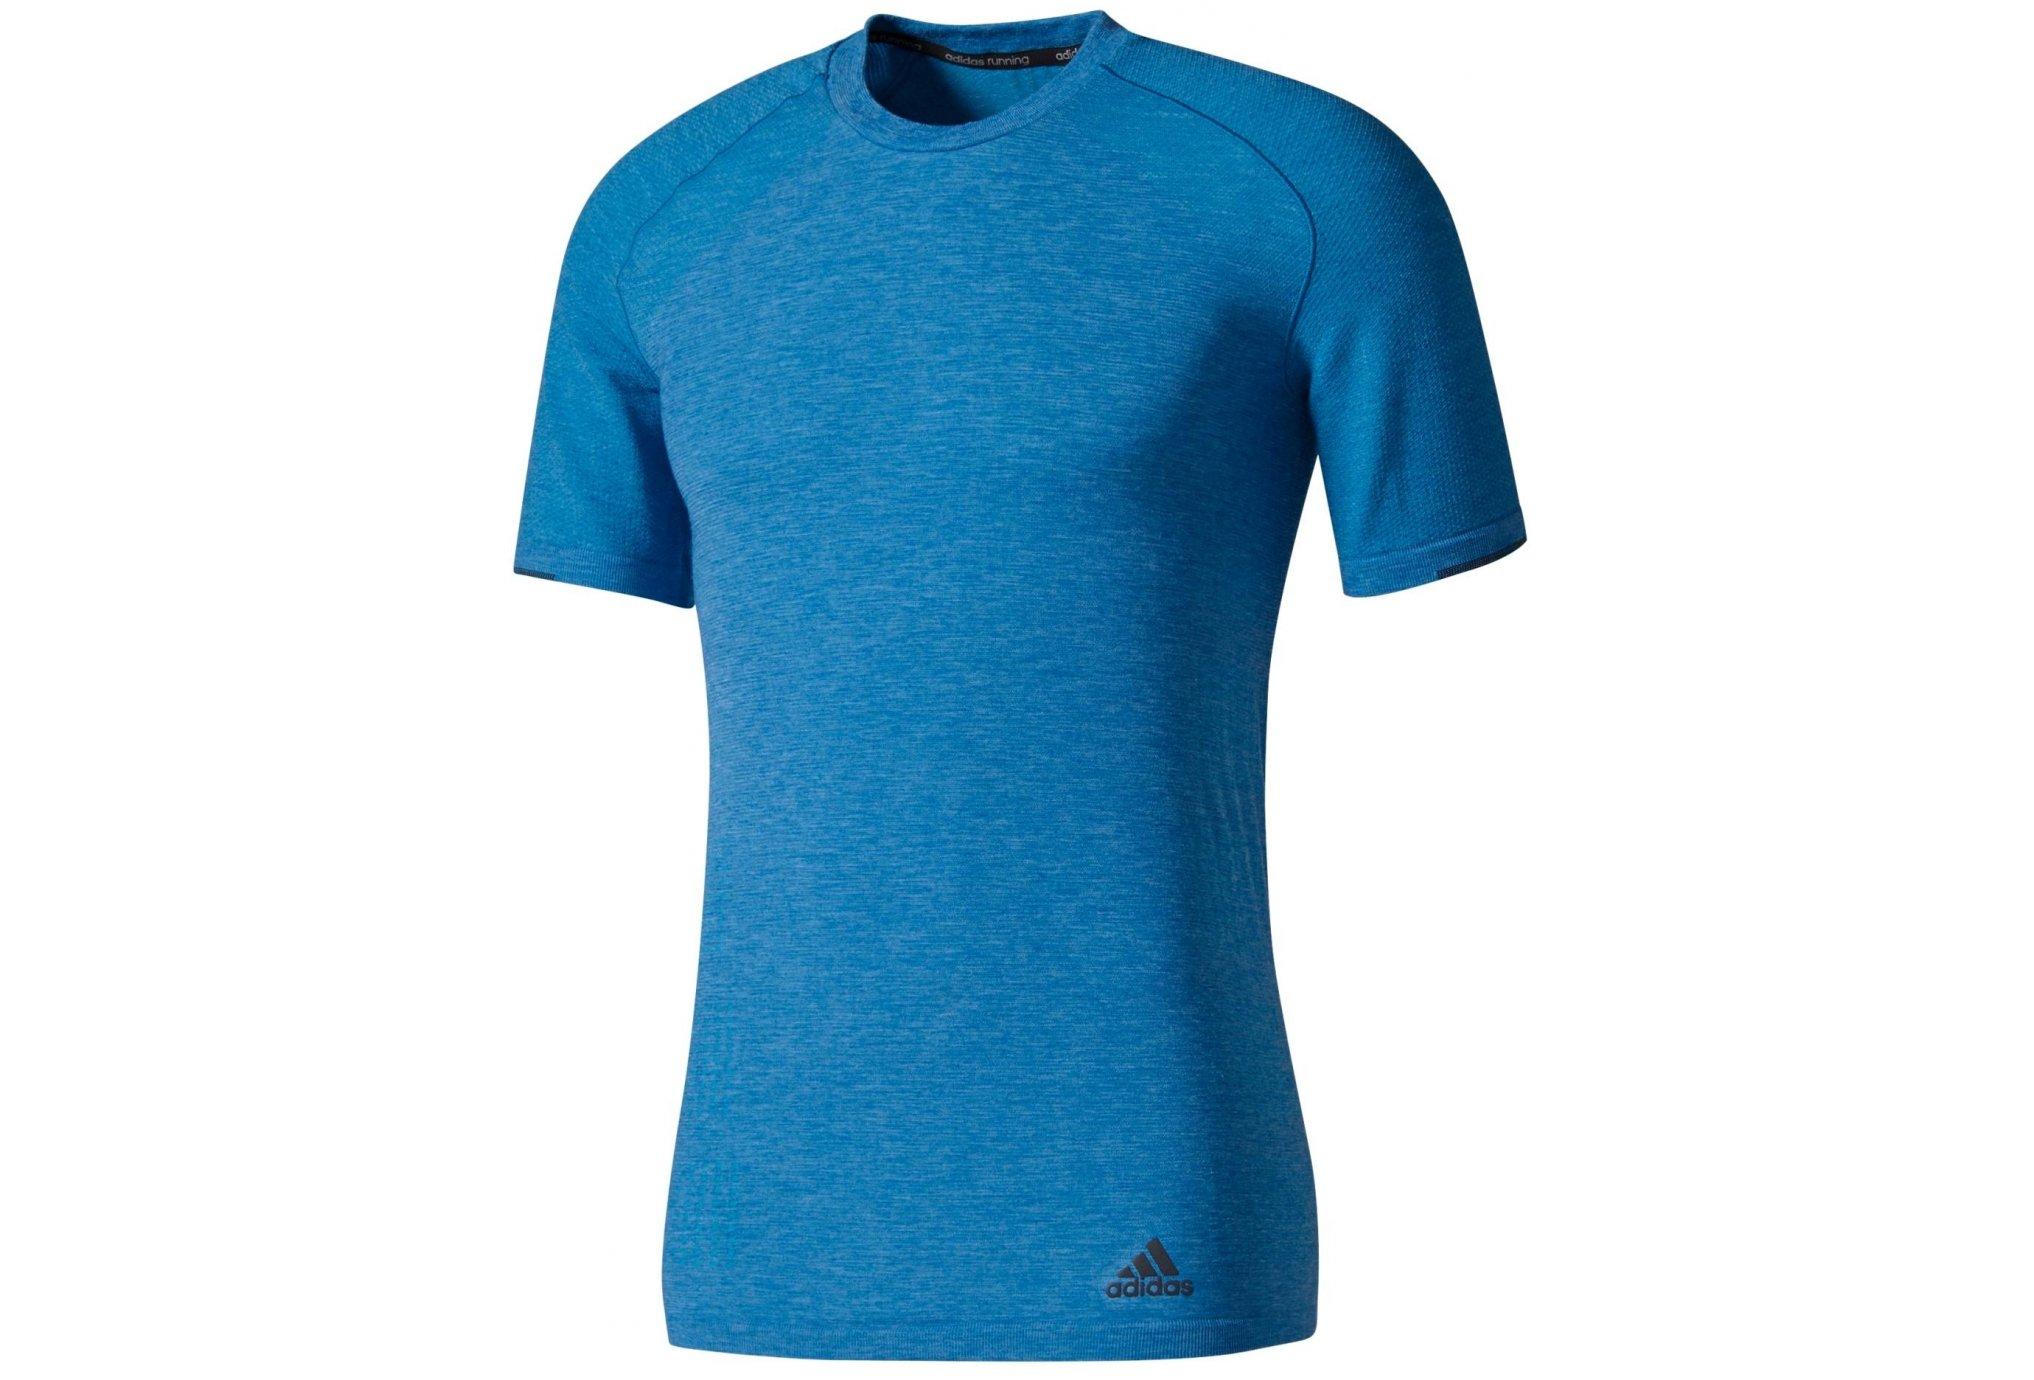 Adidas Primeknit m vêtement running homme